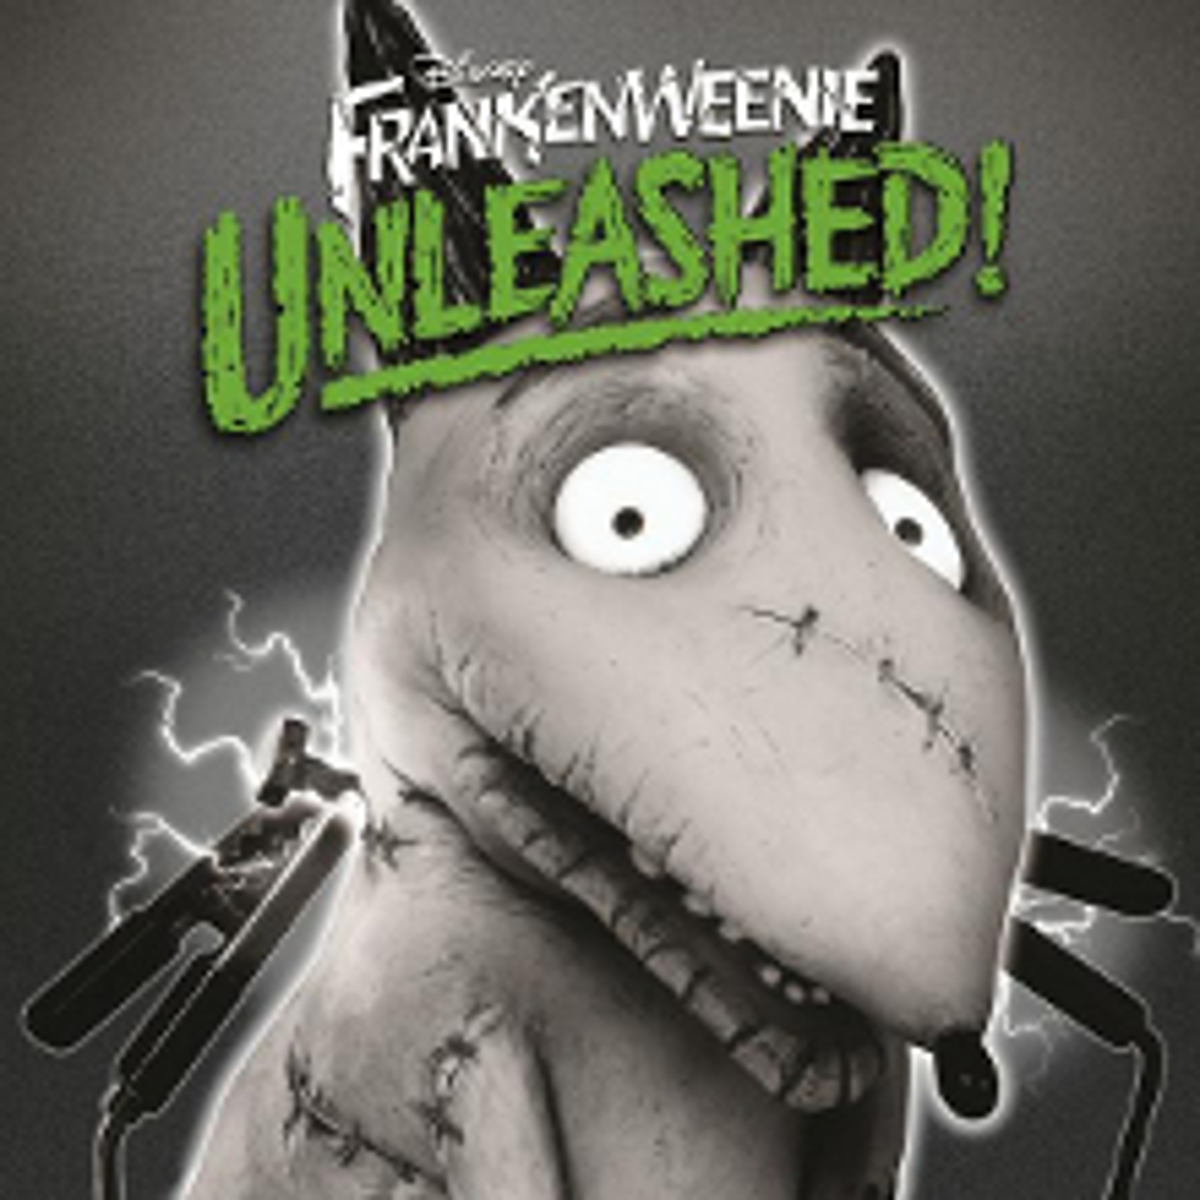 File:Frankenweenie Unleashed cover artwork.jpg